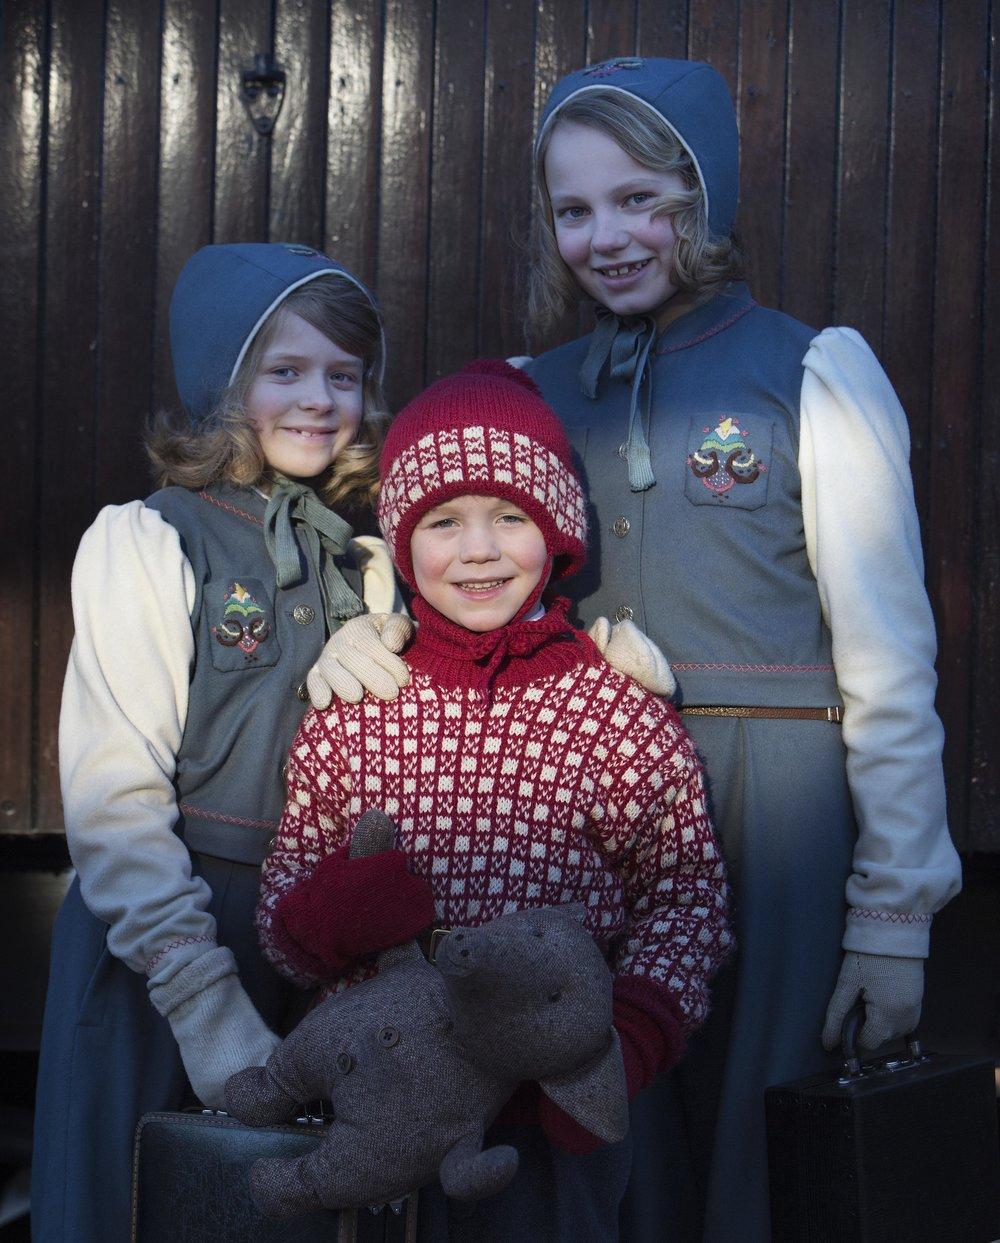 Magnus Ketilsson Dobbe (6), spiller prins Harald. Sofie Falkgård spiller prinsesse Ragnhild og Ingrid Ross Raftemo er prinsesse Astrid i filmen. Foto: Agnete Brun/ Paradox film.